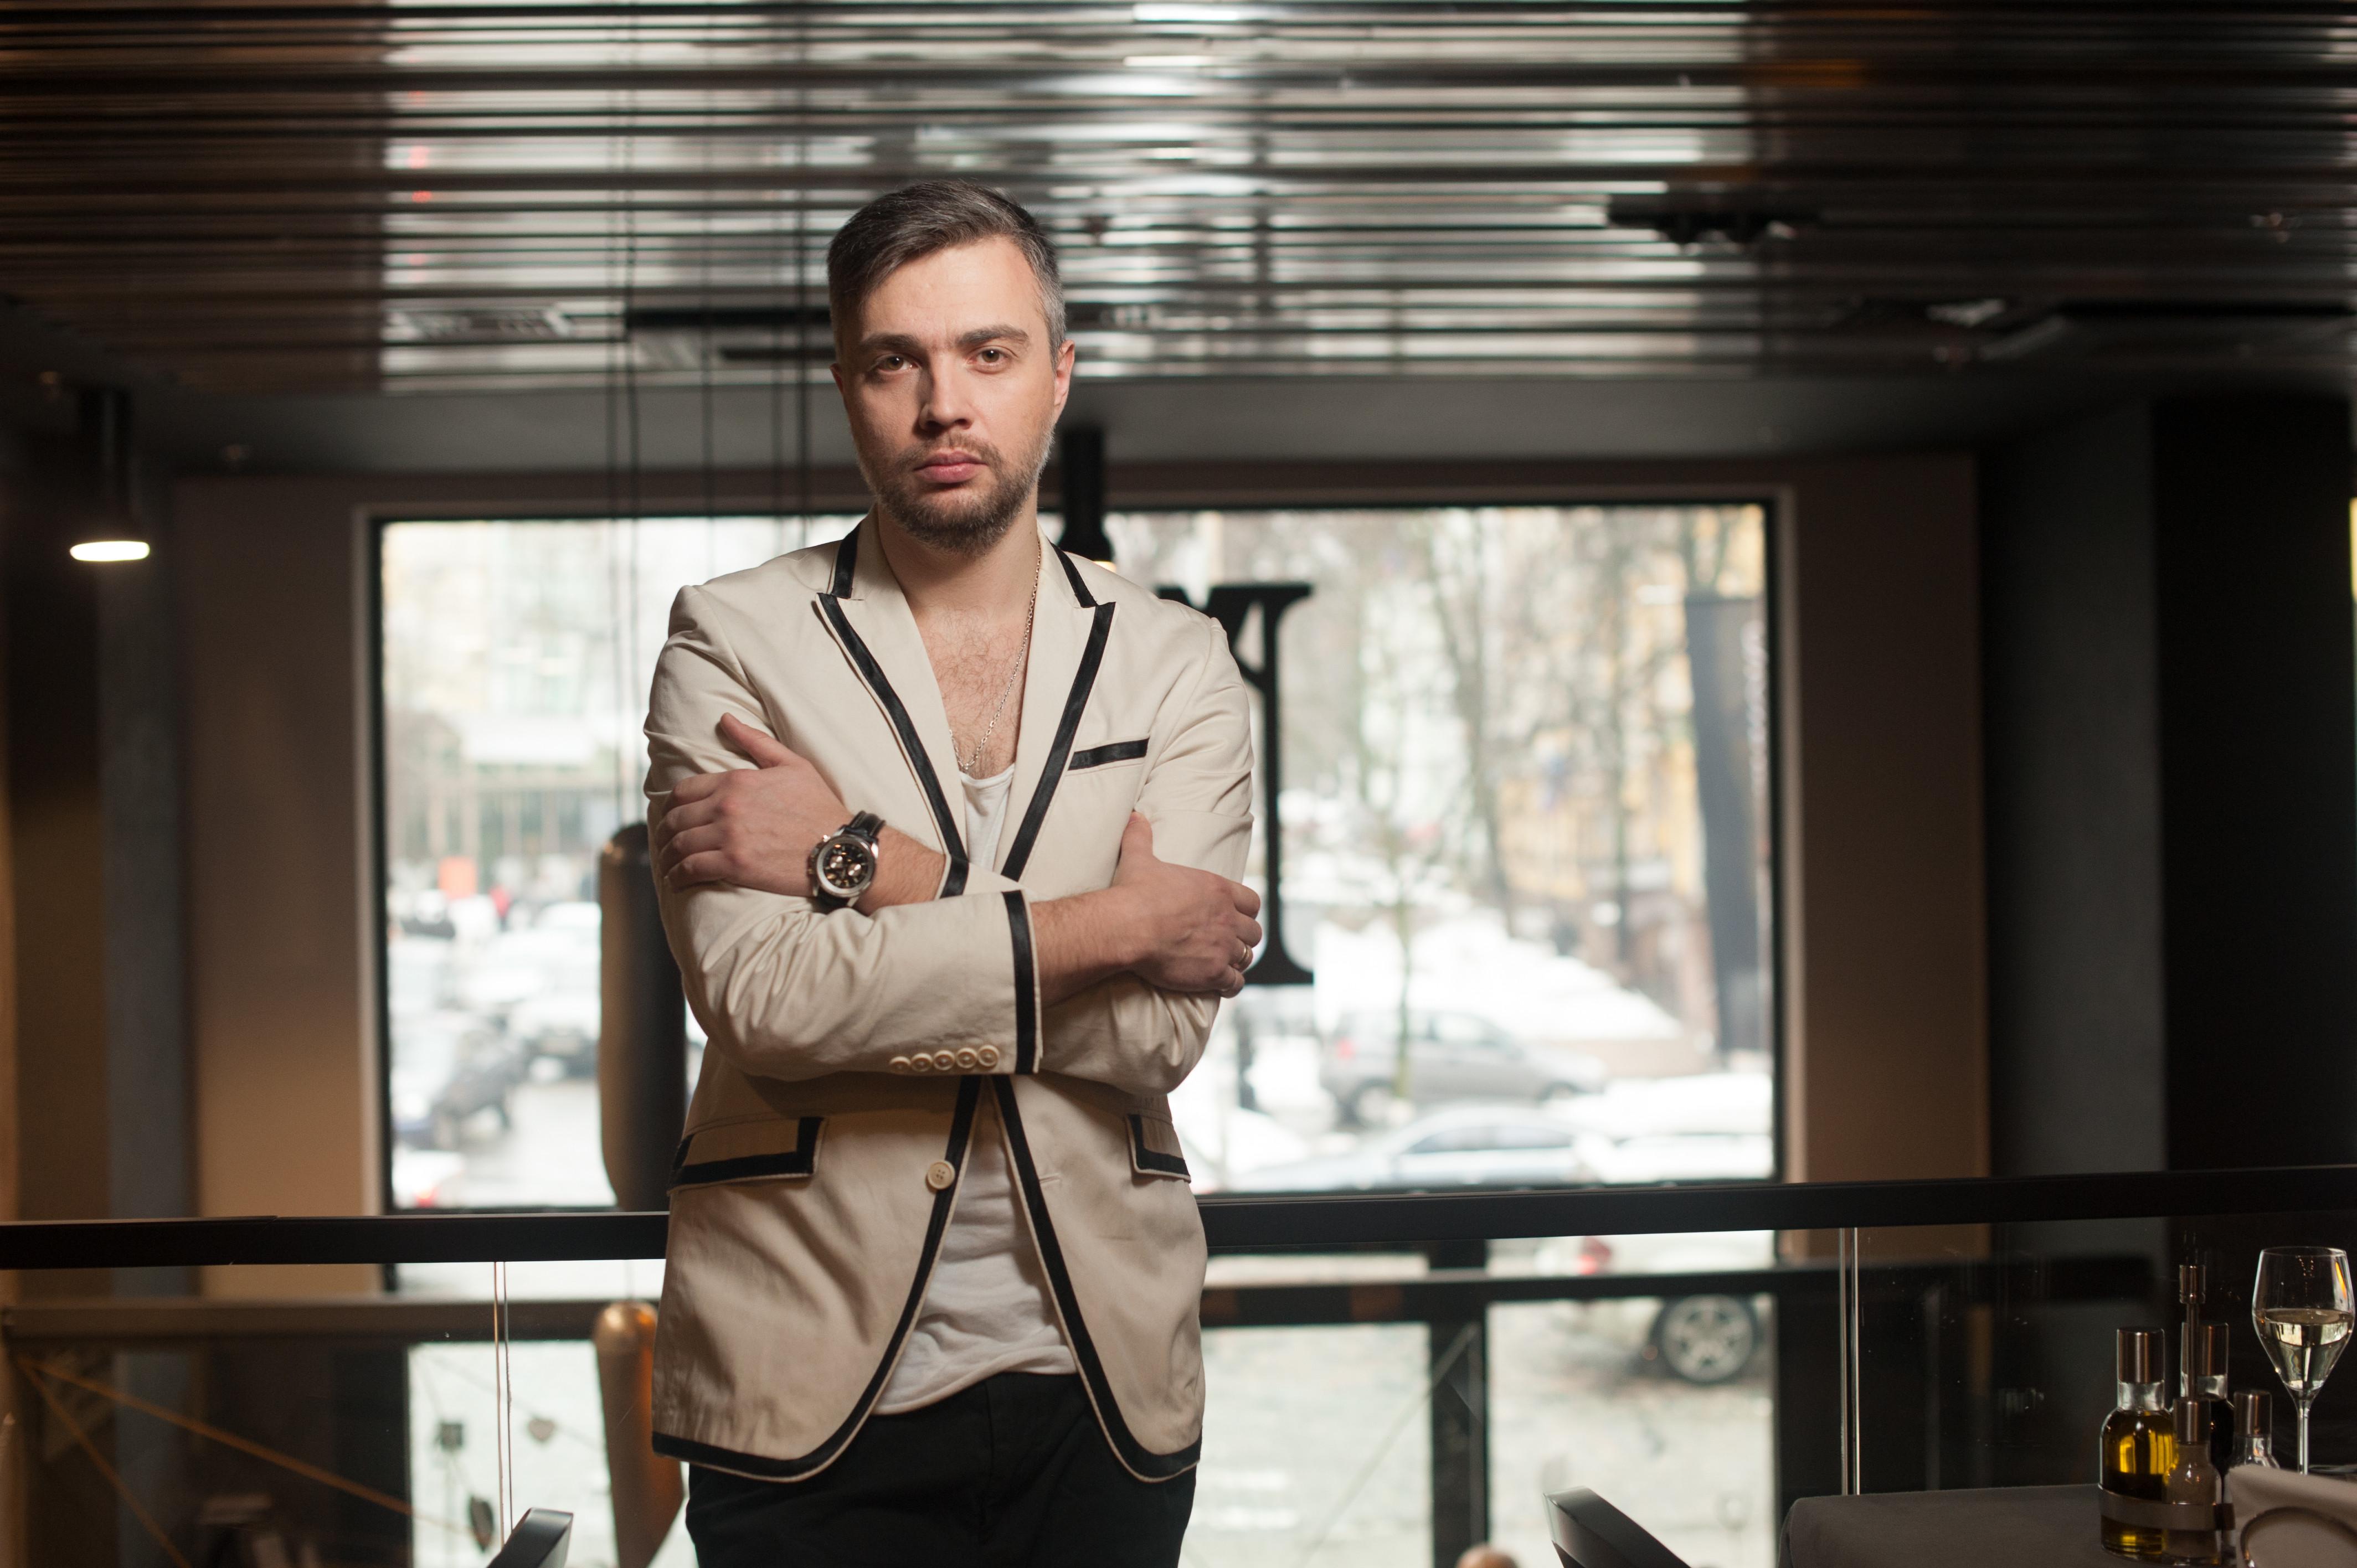 Fotossesion ARTEM N.E.B.A at Mirrors Design Hotel Kiev.